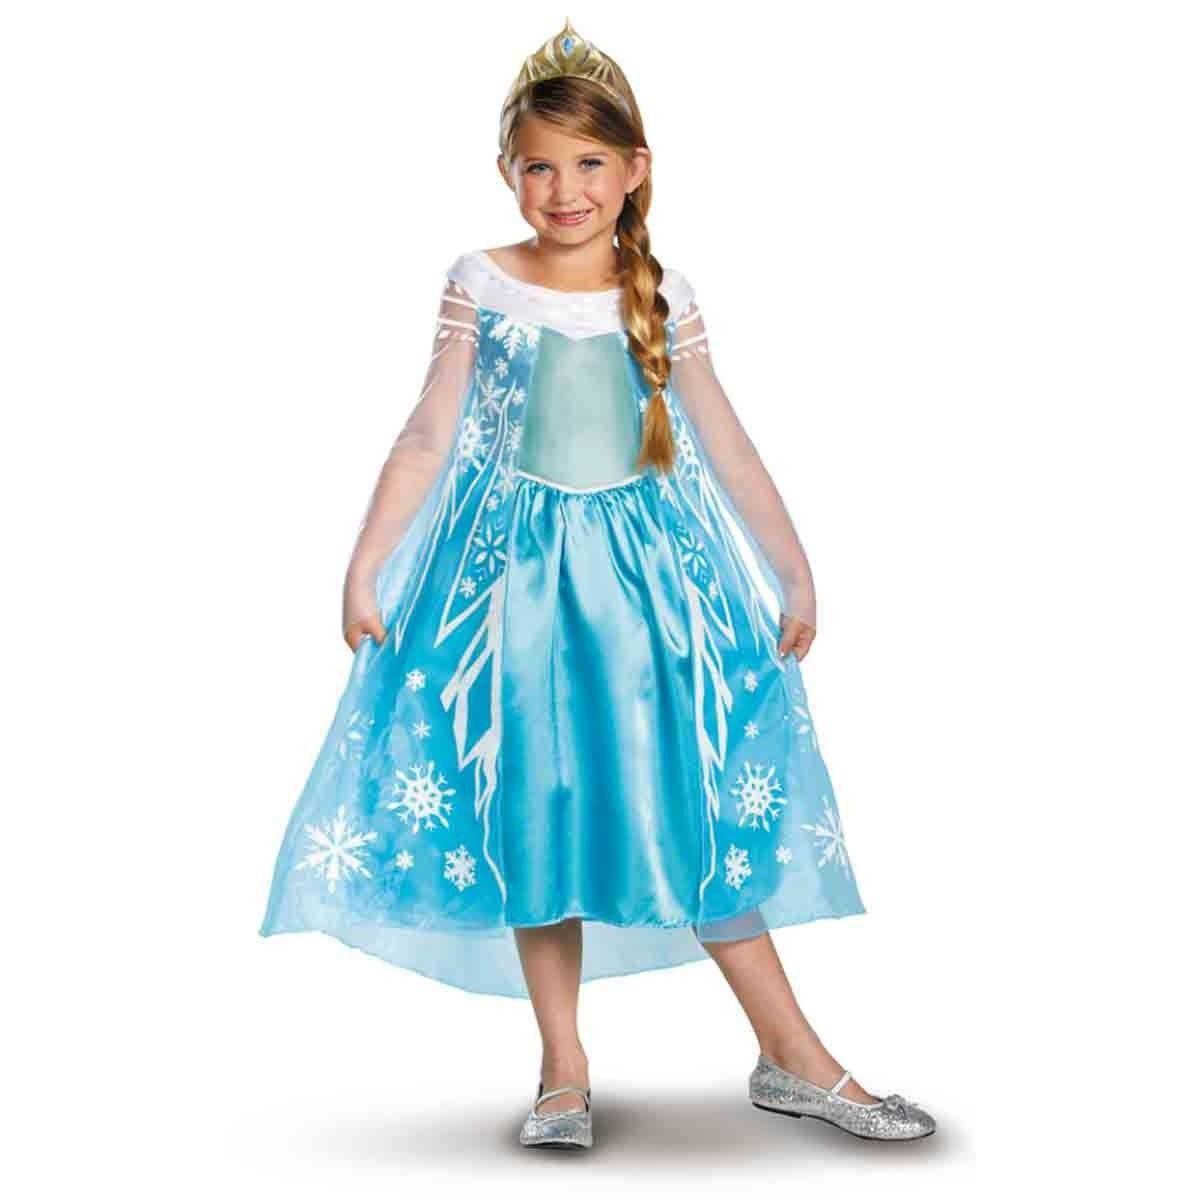 Image 0 of Frozen Princess Elsa Deluxe Aqua Blue Dress Child Costume/Tiara Disguise 56998 -